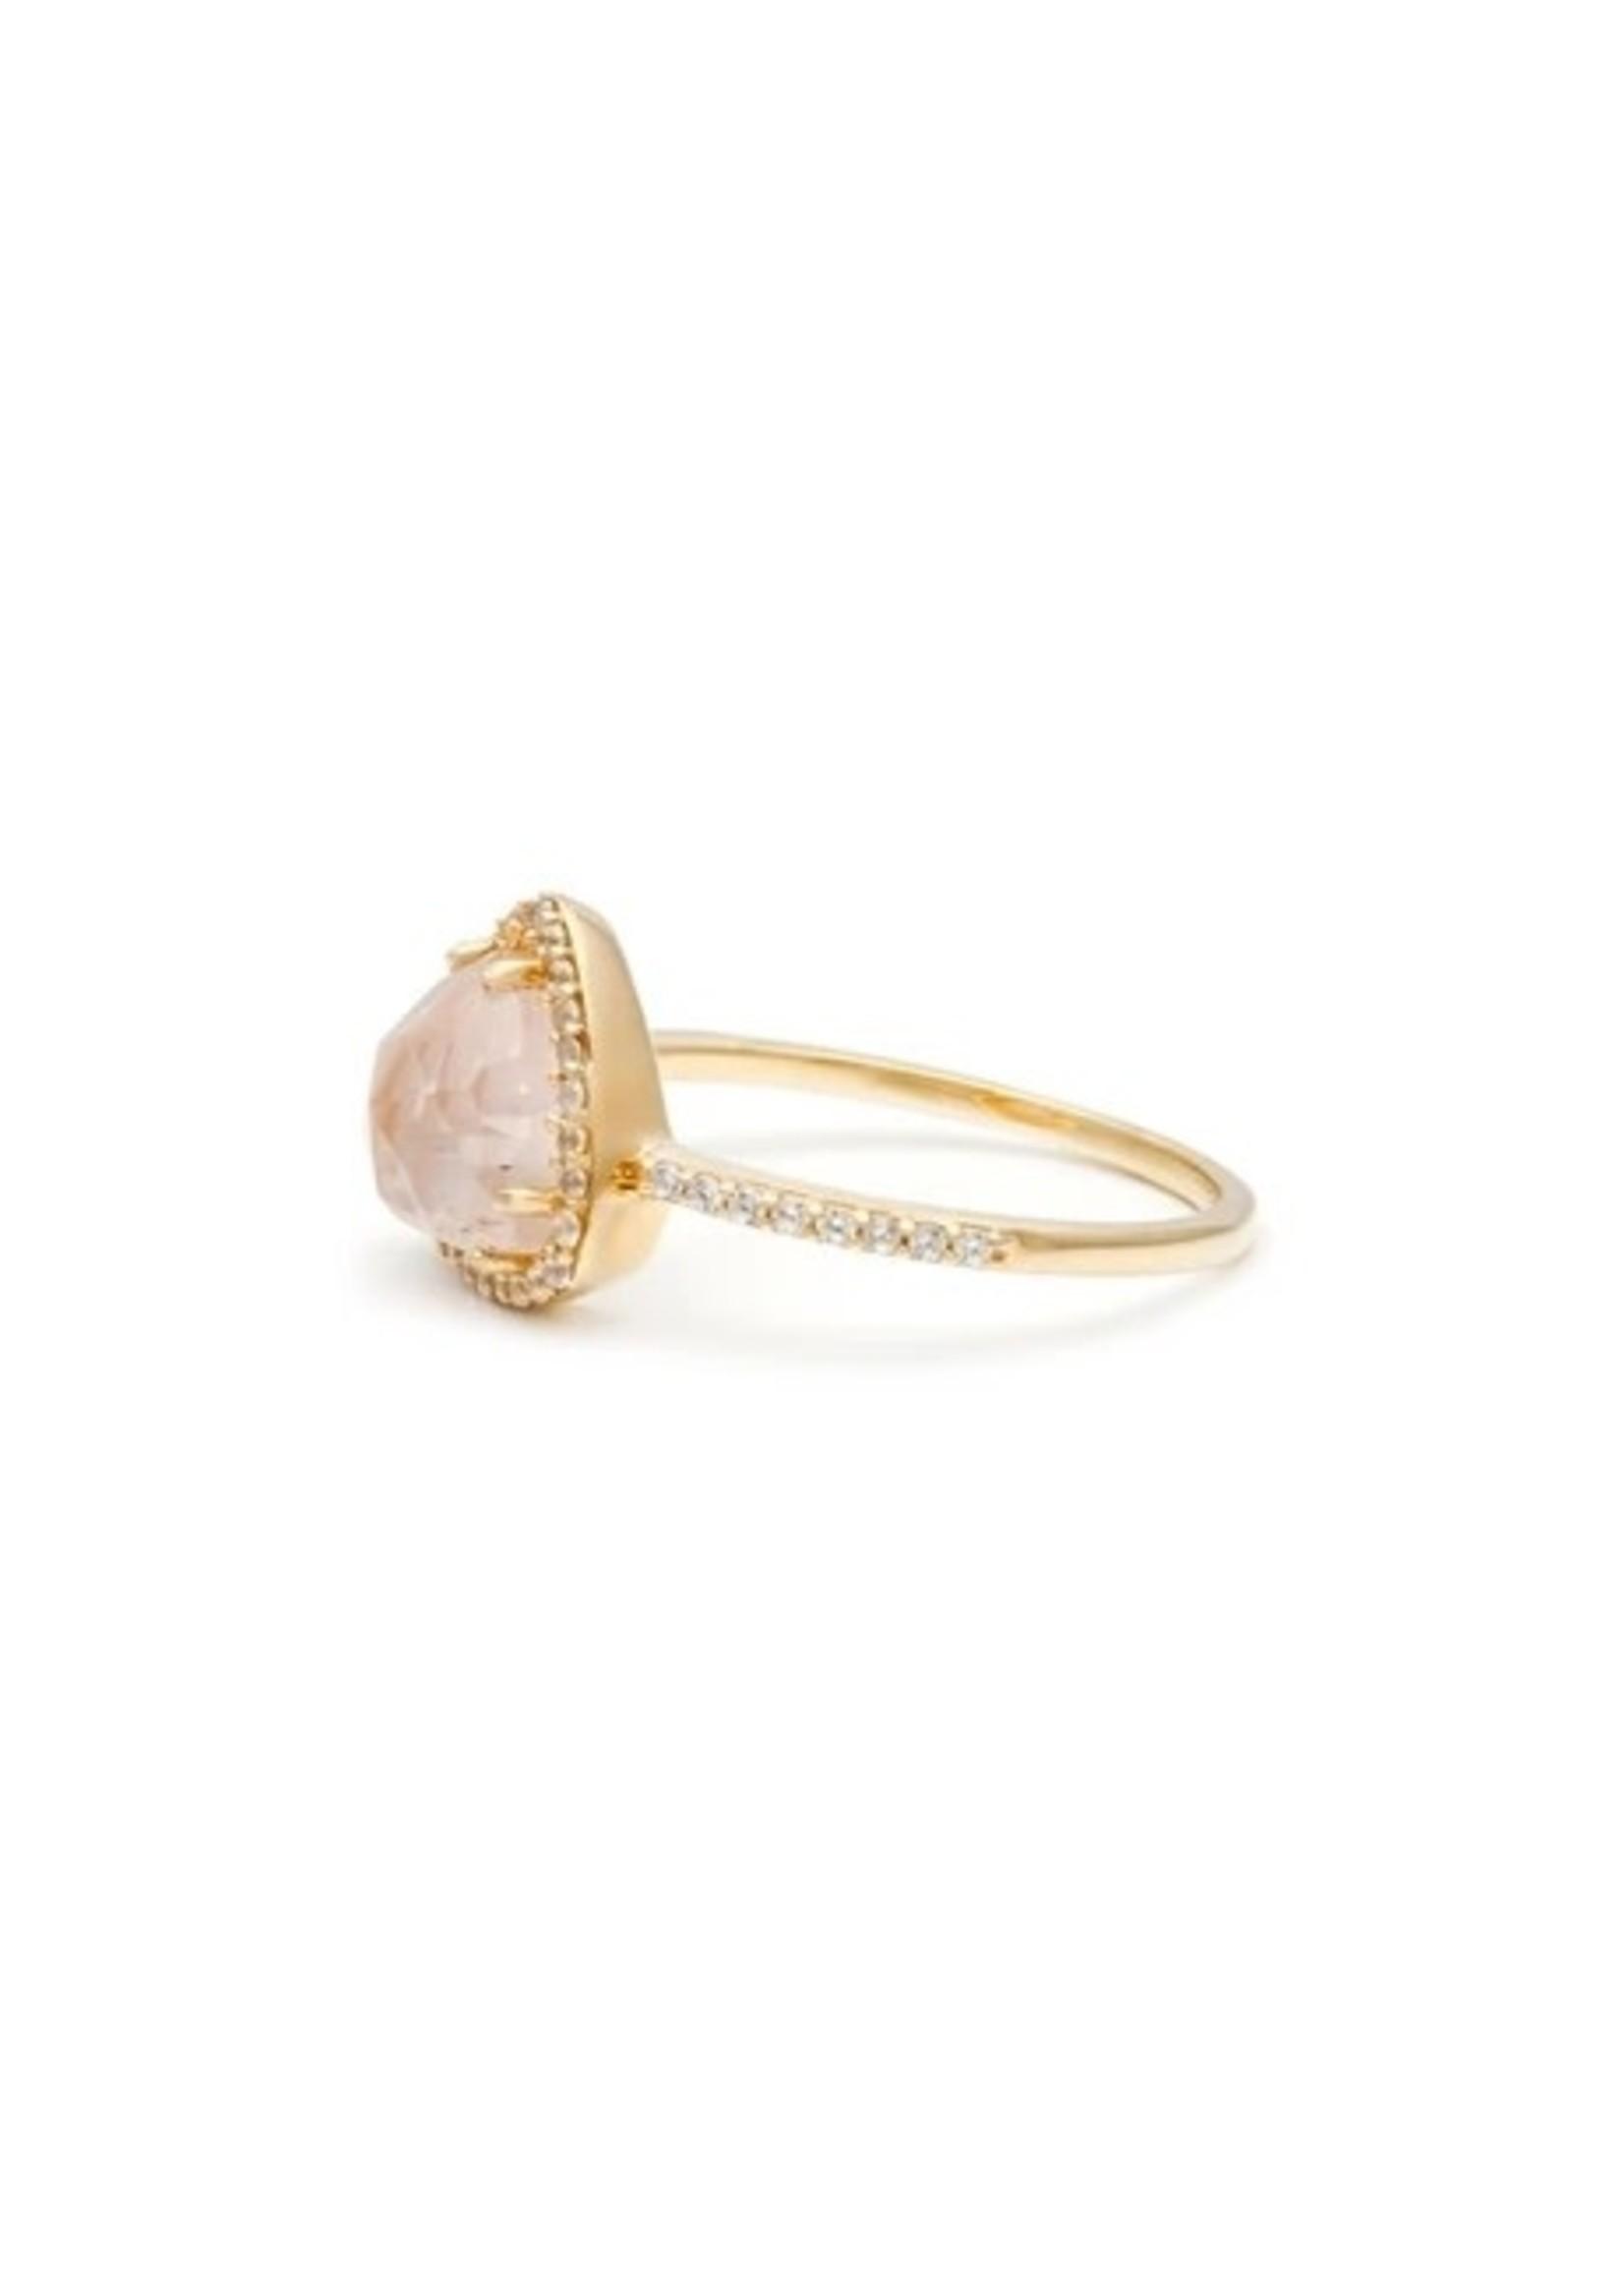 LEAH ALEXANDRA Trielle Ring, Rose Quartz